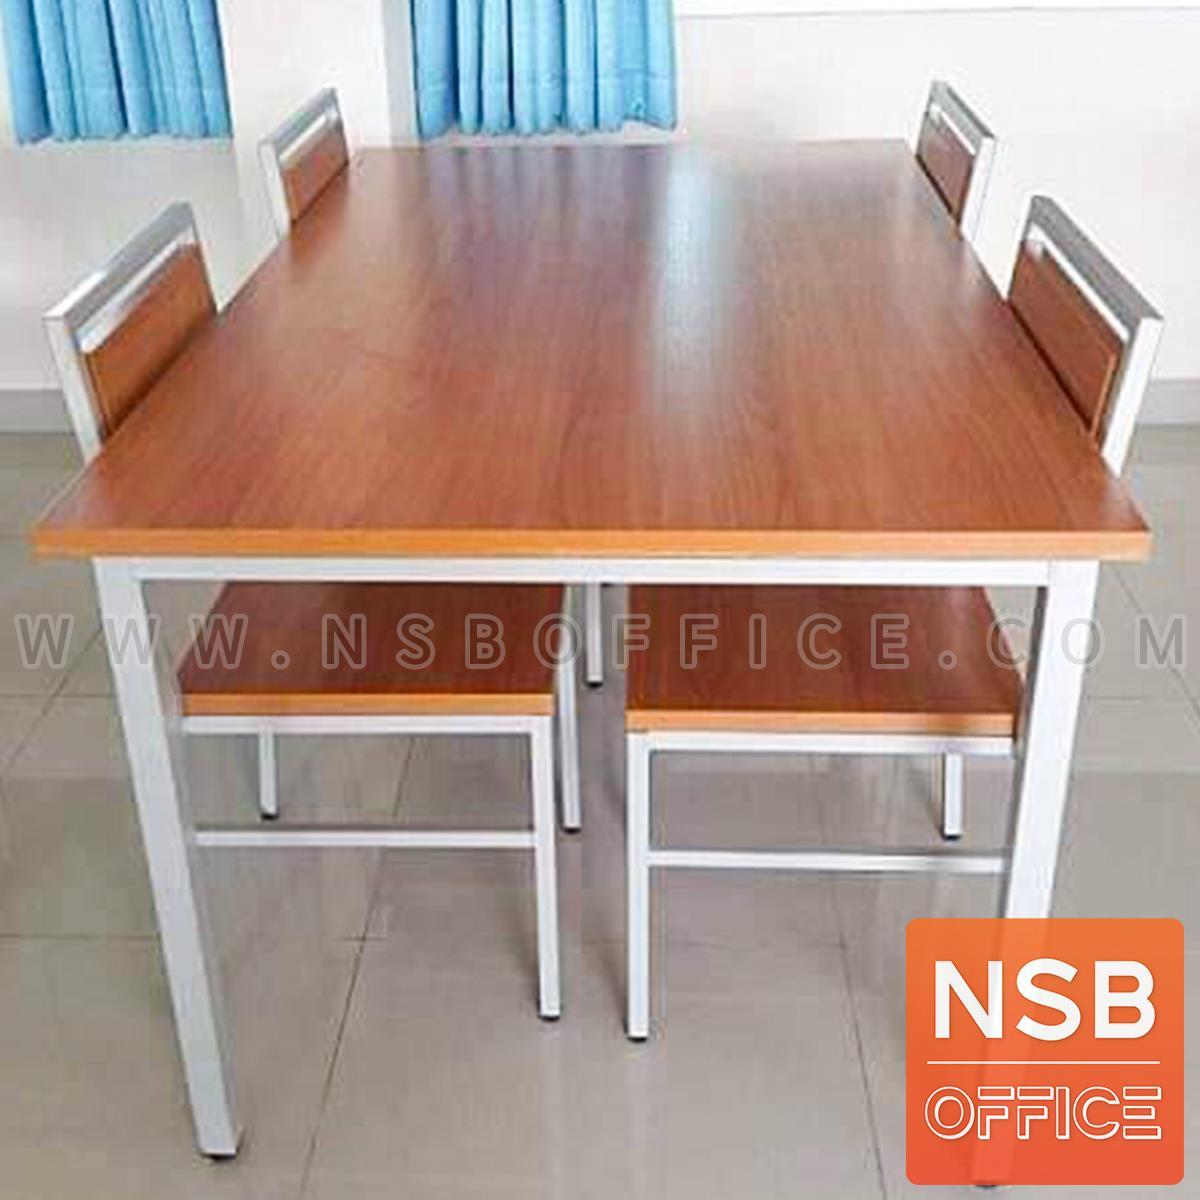 A17A096:ชุดโต๊ะและเก้าอี้นักเรียนไม้ รุ่น Sunshine (ซันไชน์) ขนาด 120W, 150W cm. พร้อมเก้าอี้